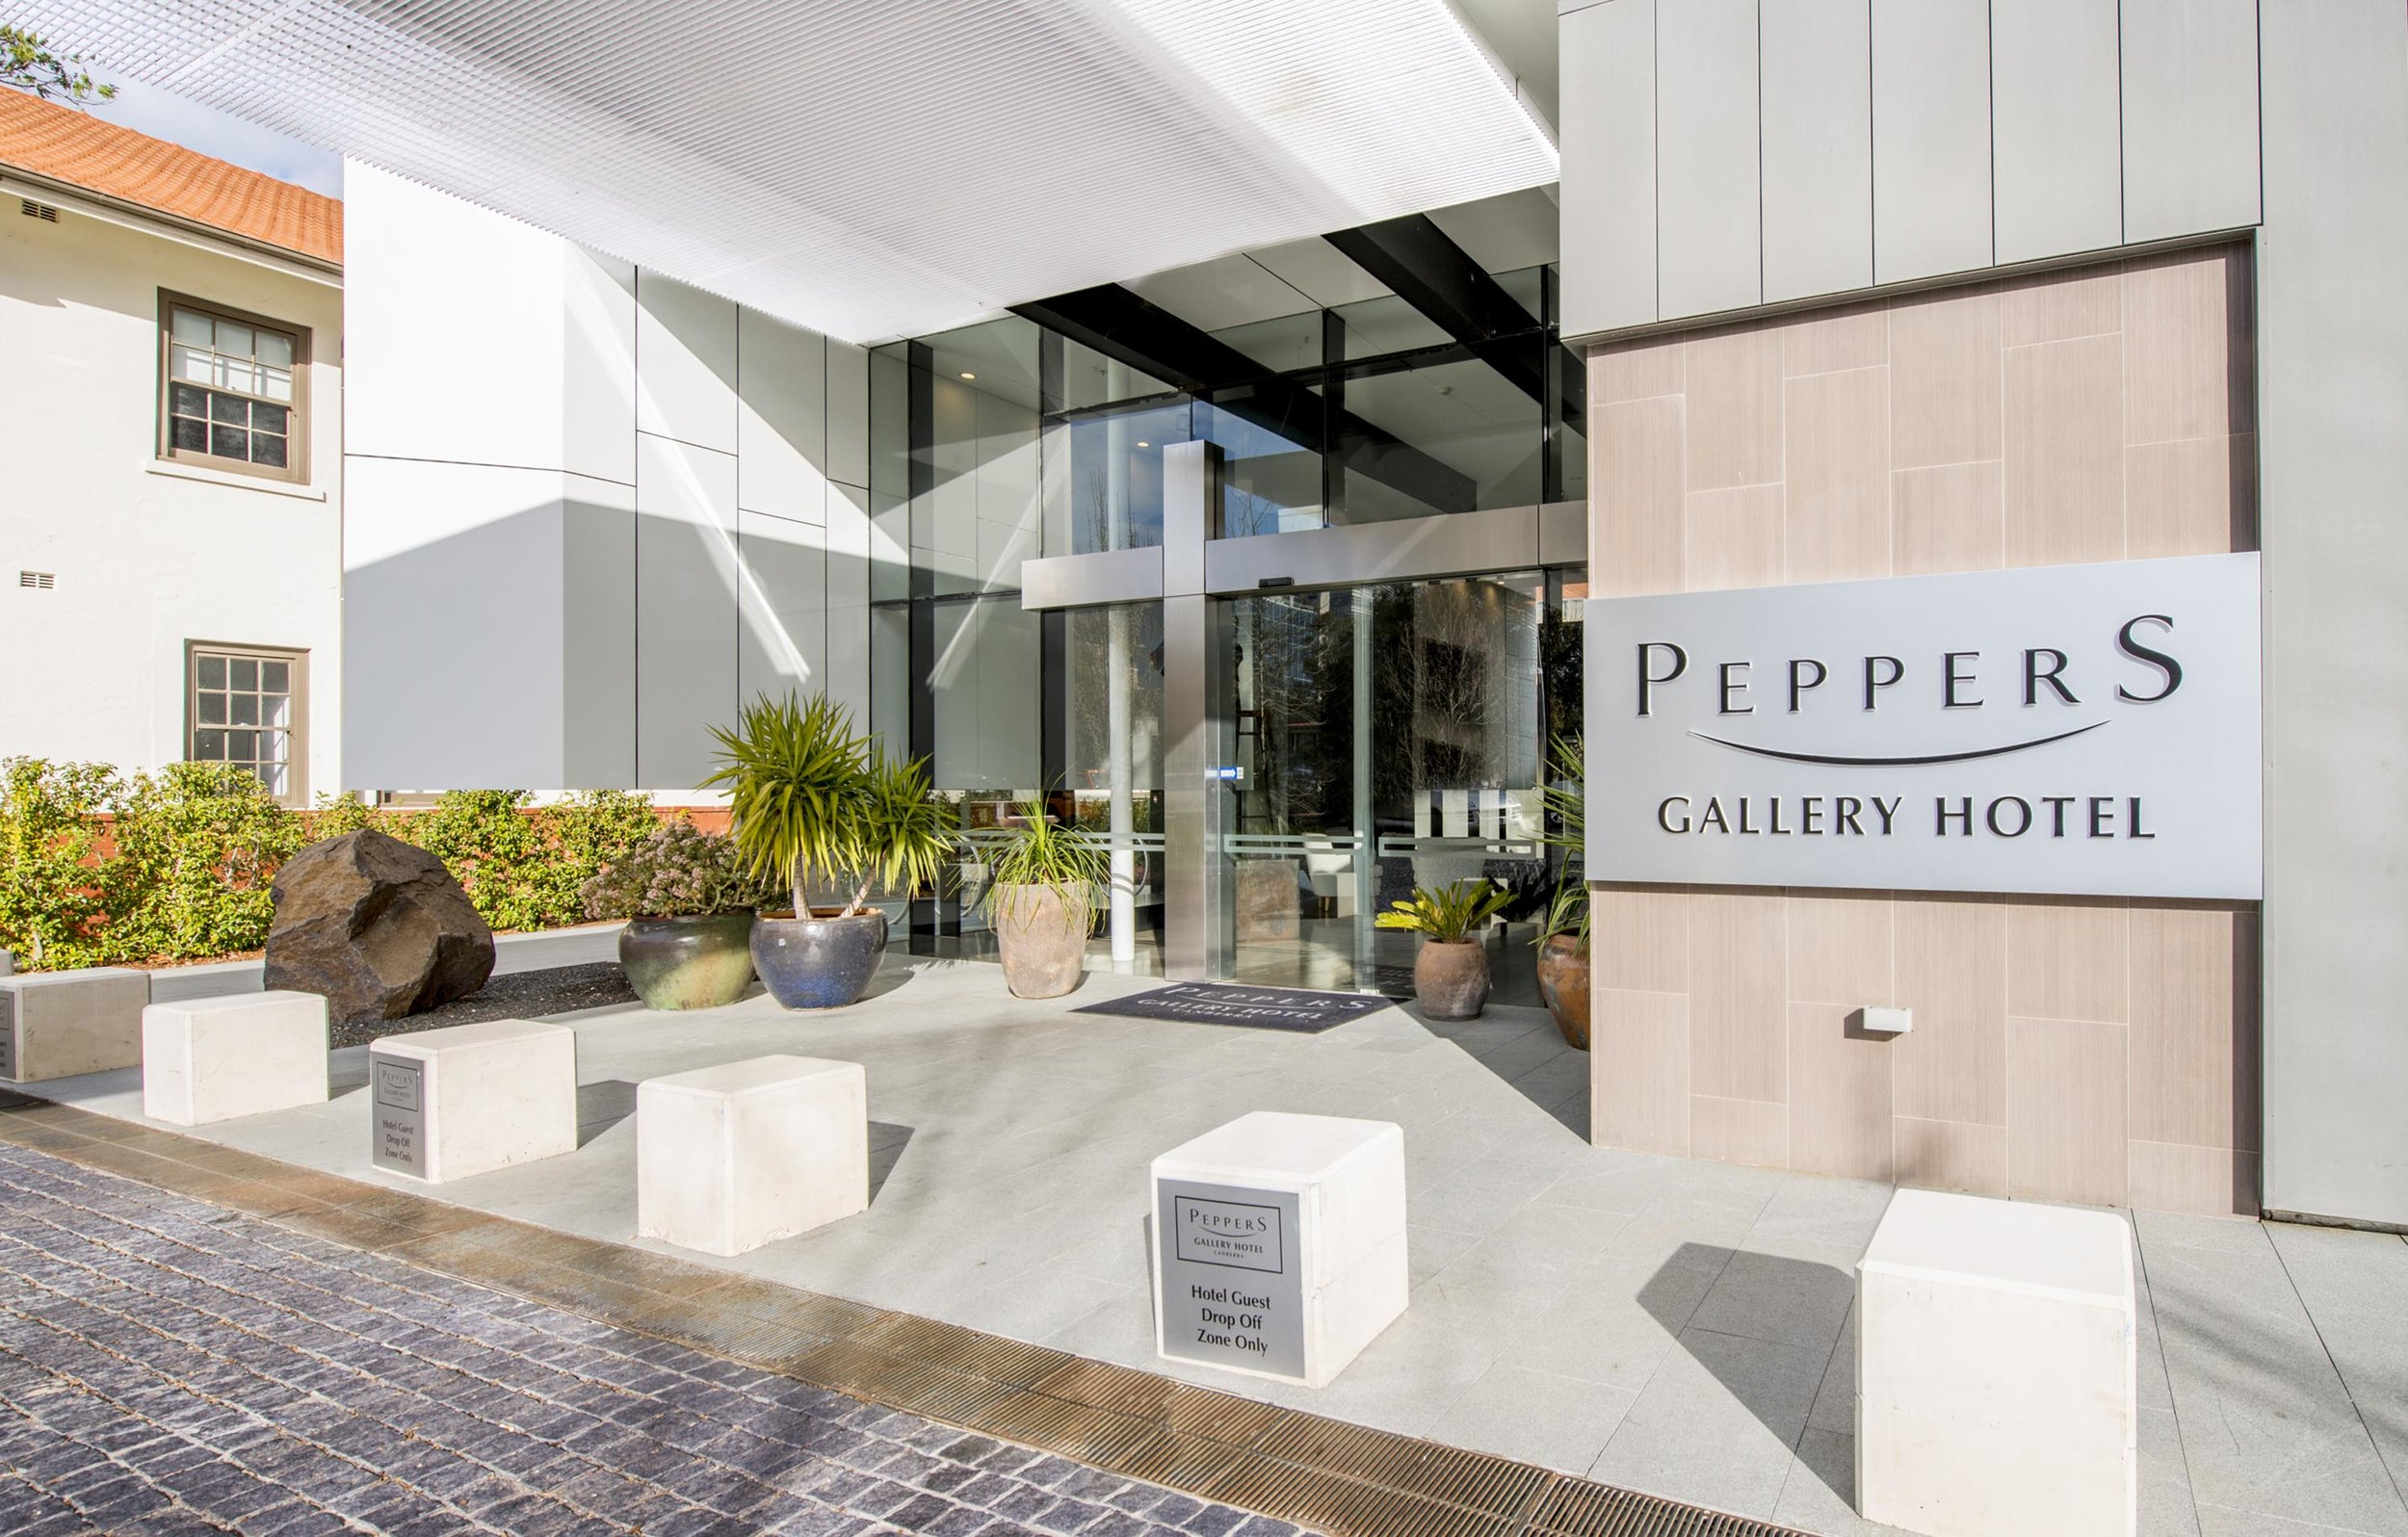 Peppers Gallery Hotel - Exterior.jpg